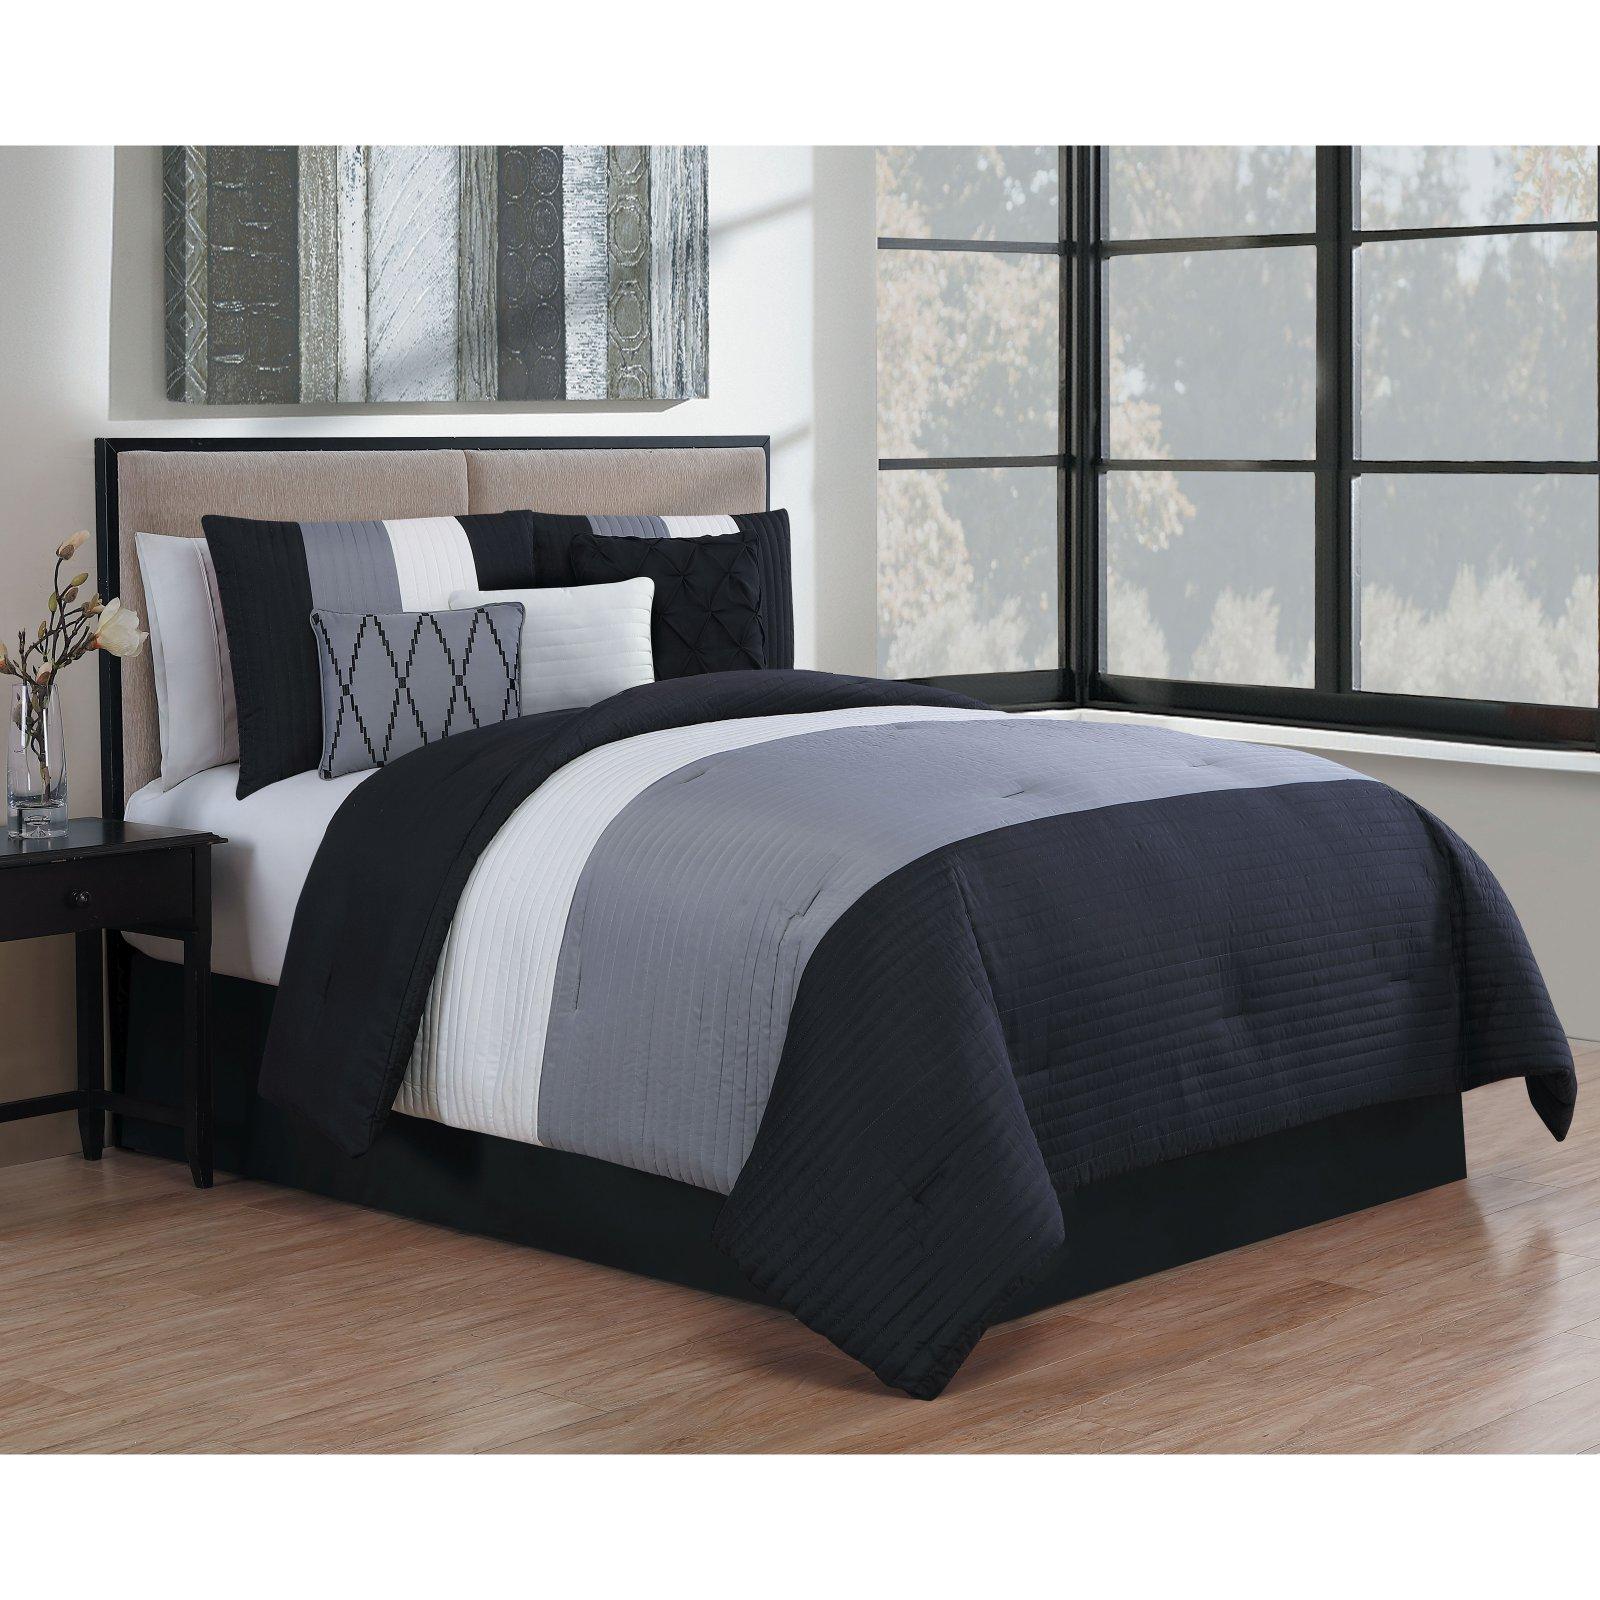 Manchester 7 Piece Comforter Set By Avondale Manor Black White